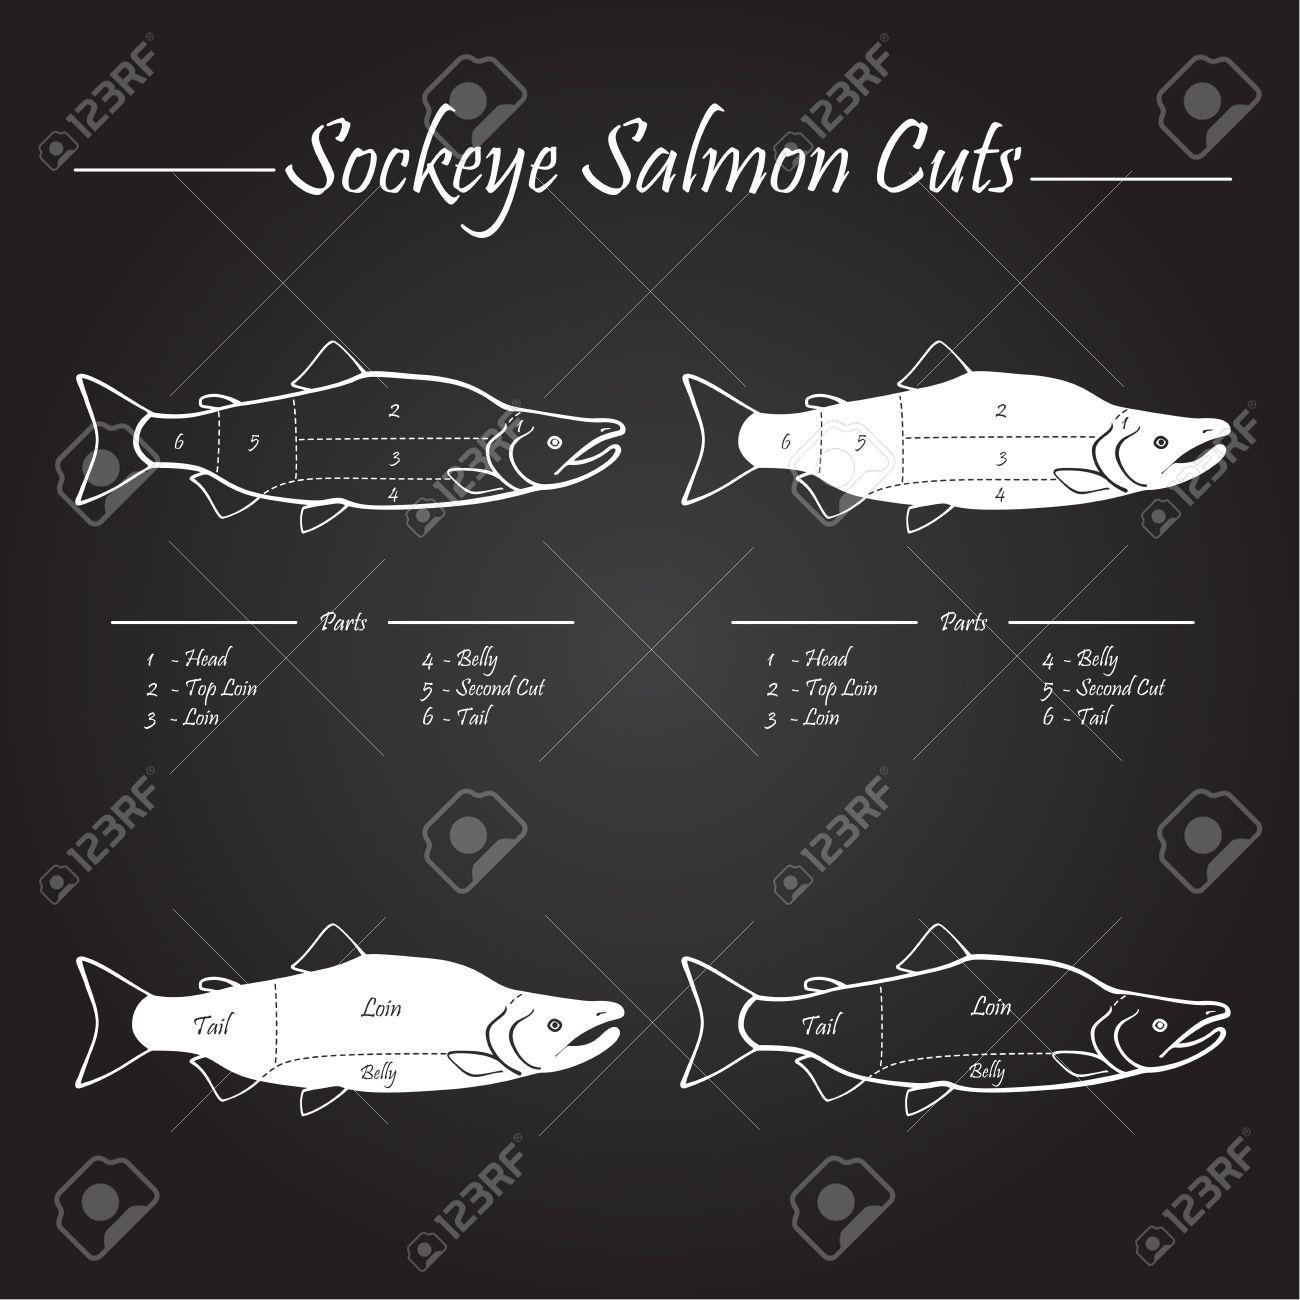 Salmon Cuts Diagram - Circuit Connection Diagram •